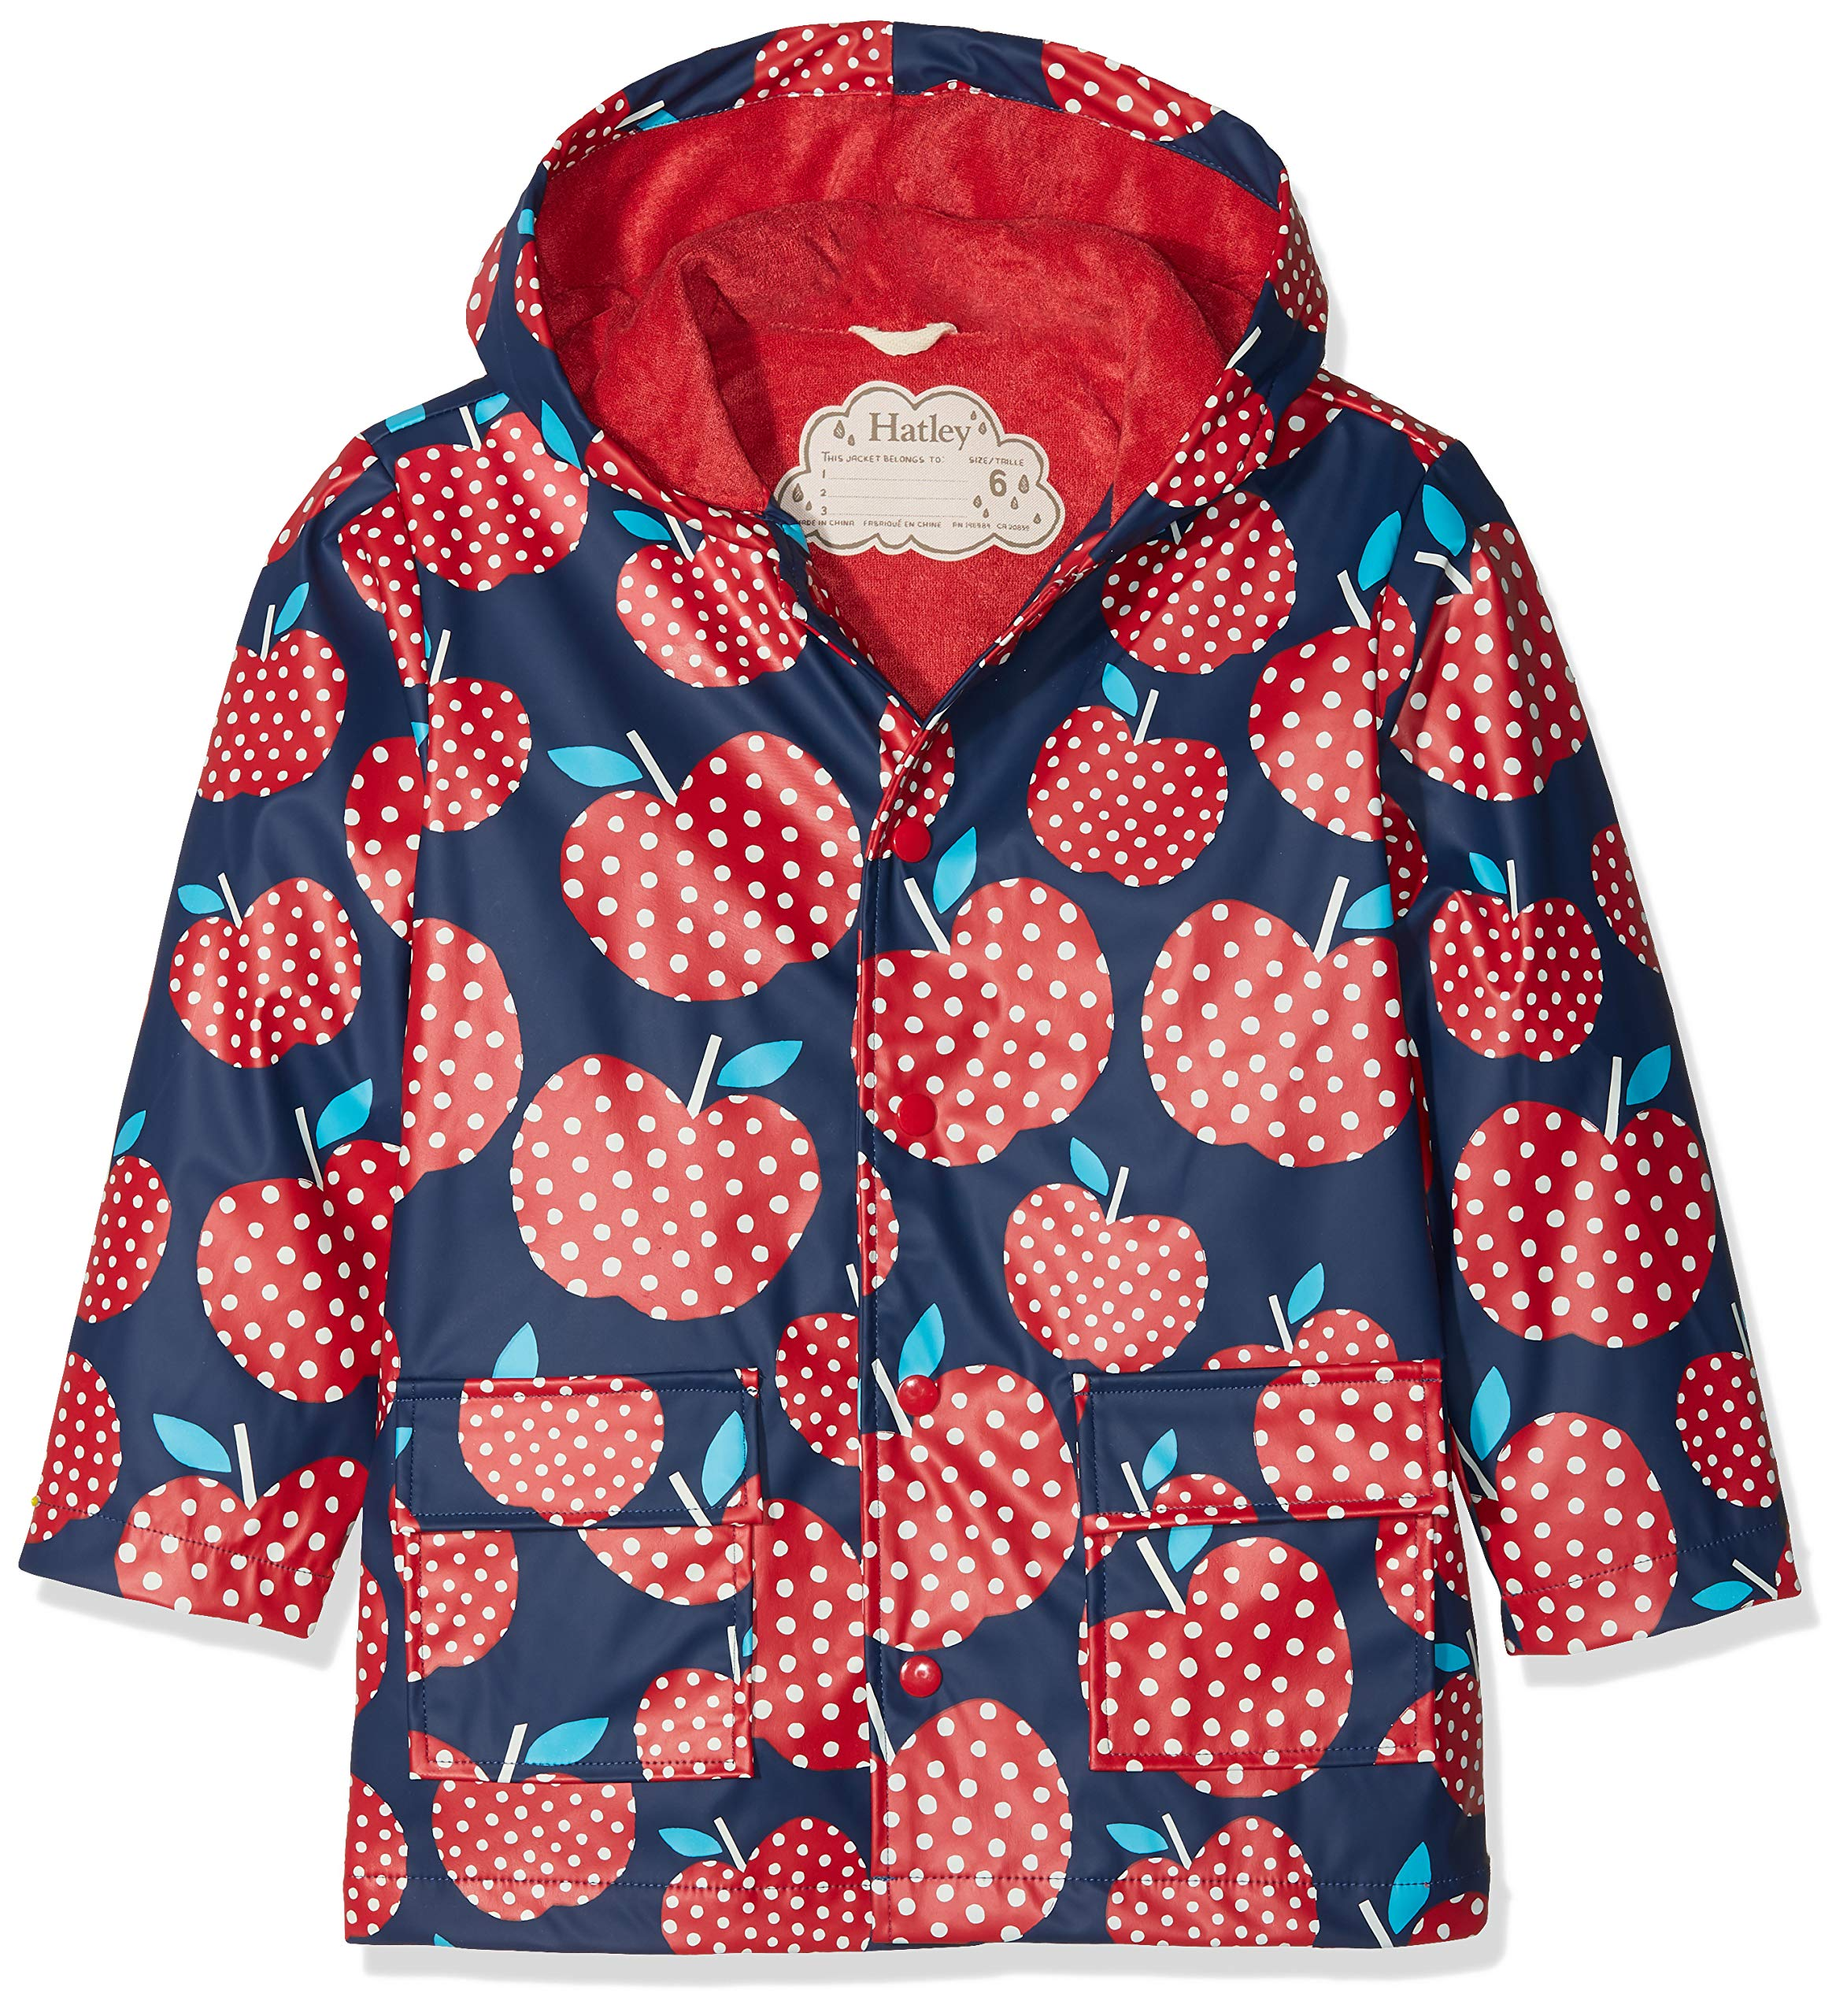 Hatley Girls' Little Printed Raincoats, Polka dot Apples, 2